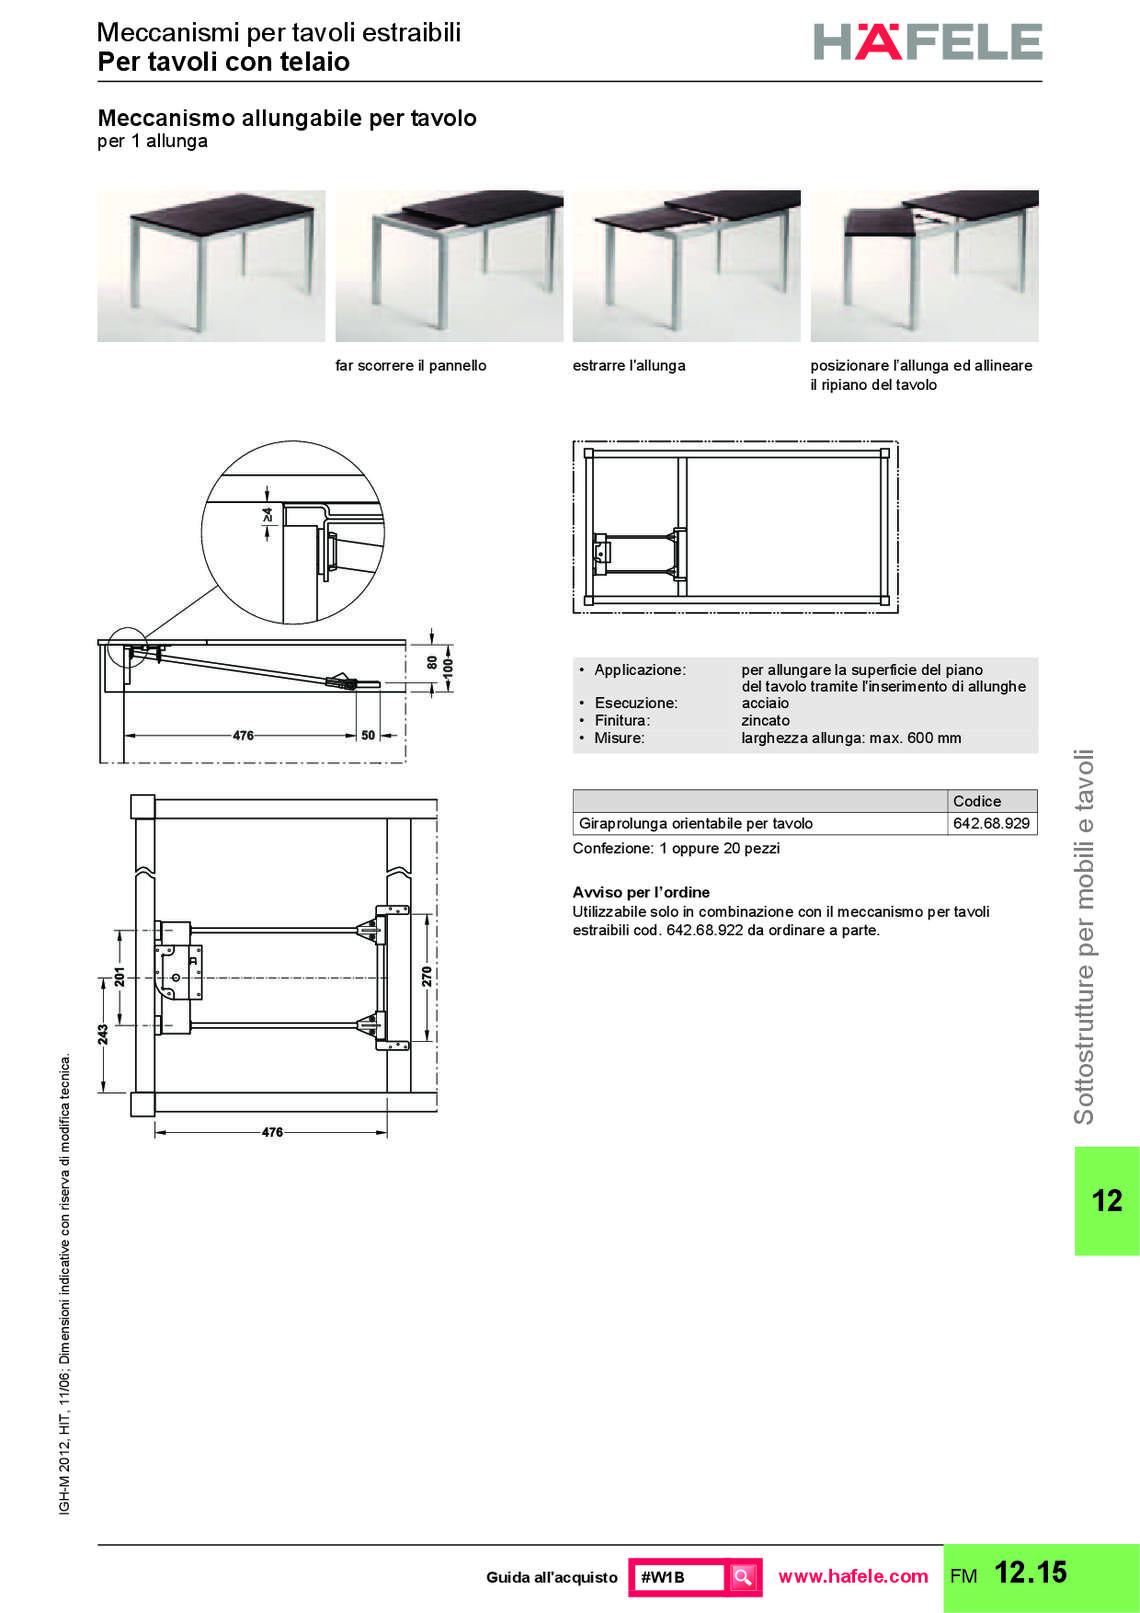 hafele-sottostrutture-per-mobili_83_026.jpg